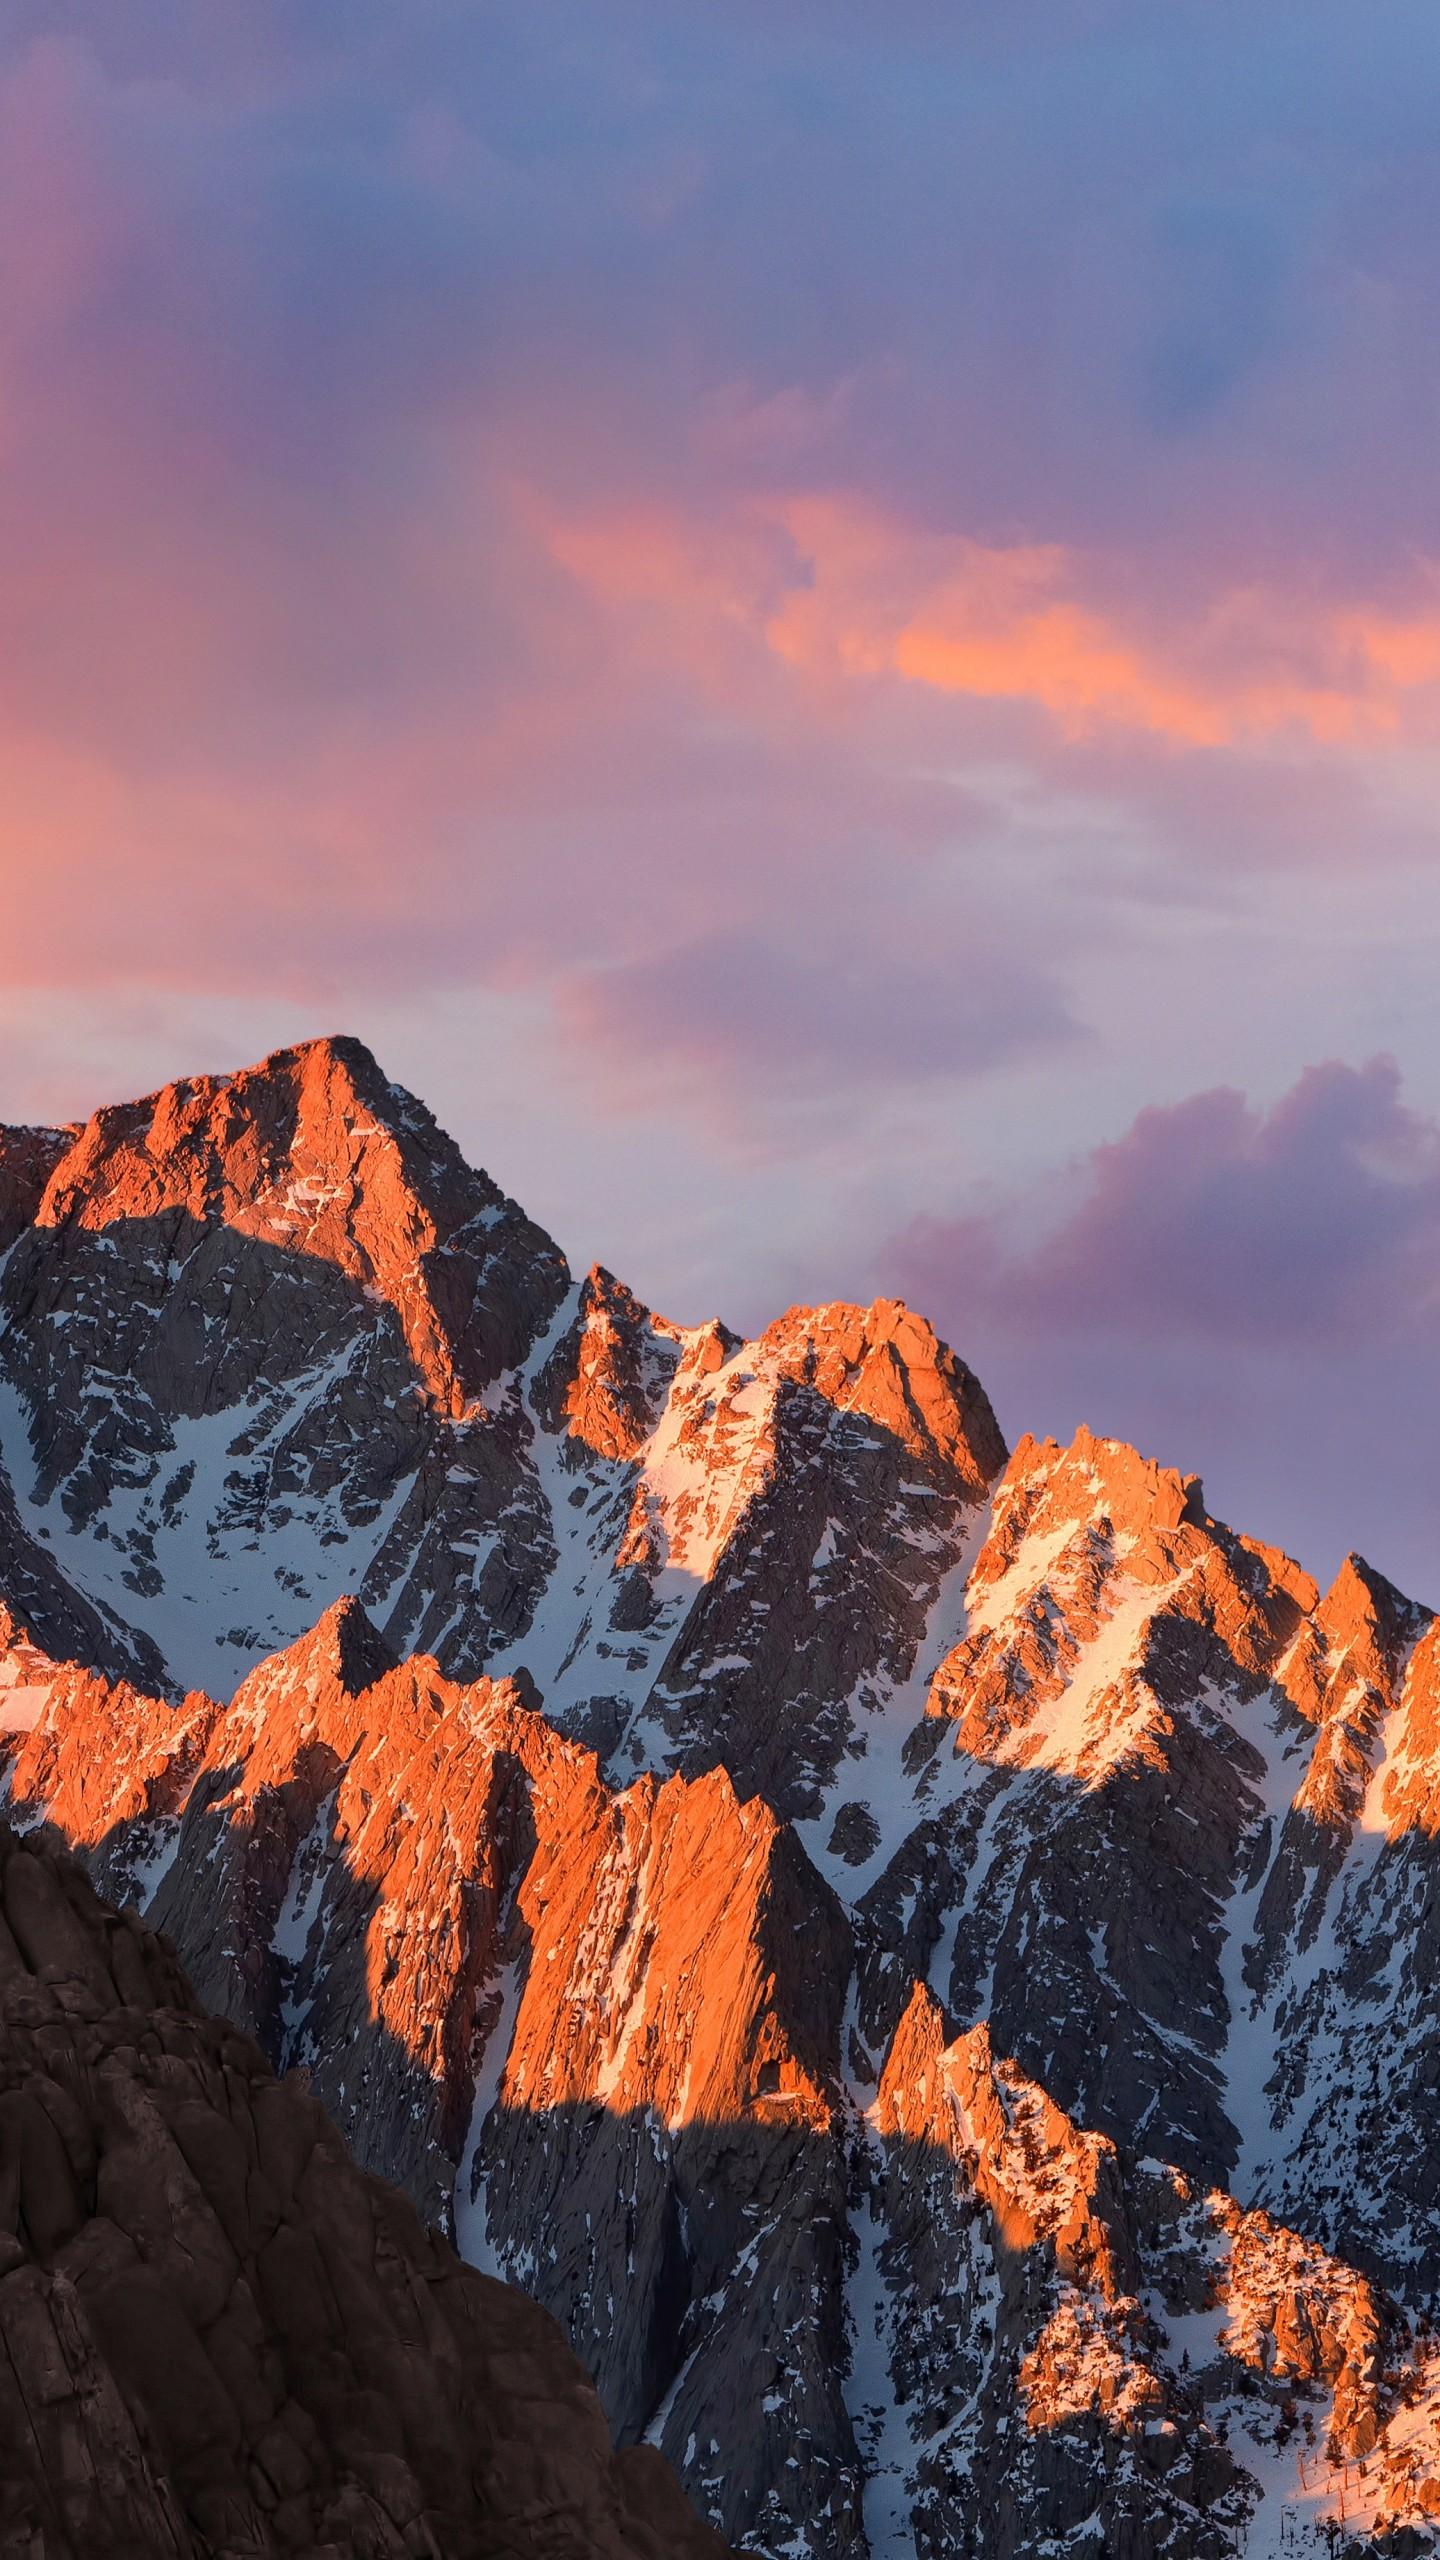 Wallpaper Mountains Macos 4k 5k Sierra Sky Android Wallpaper Os 11473